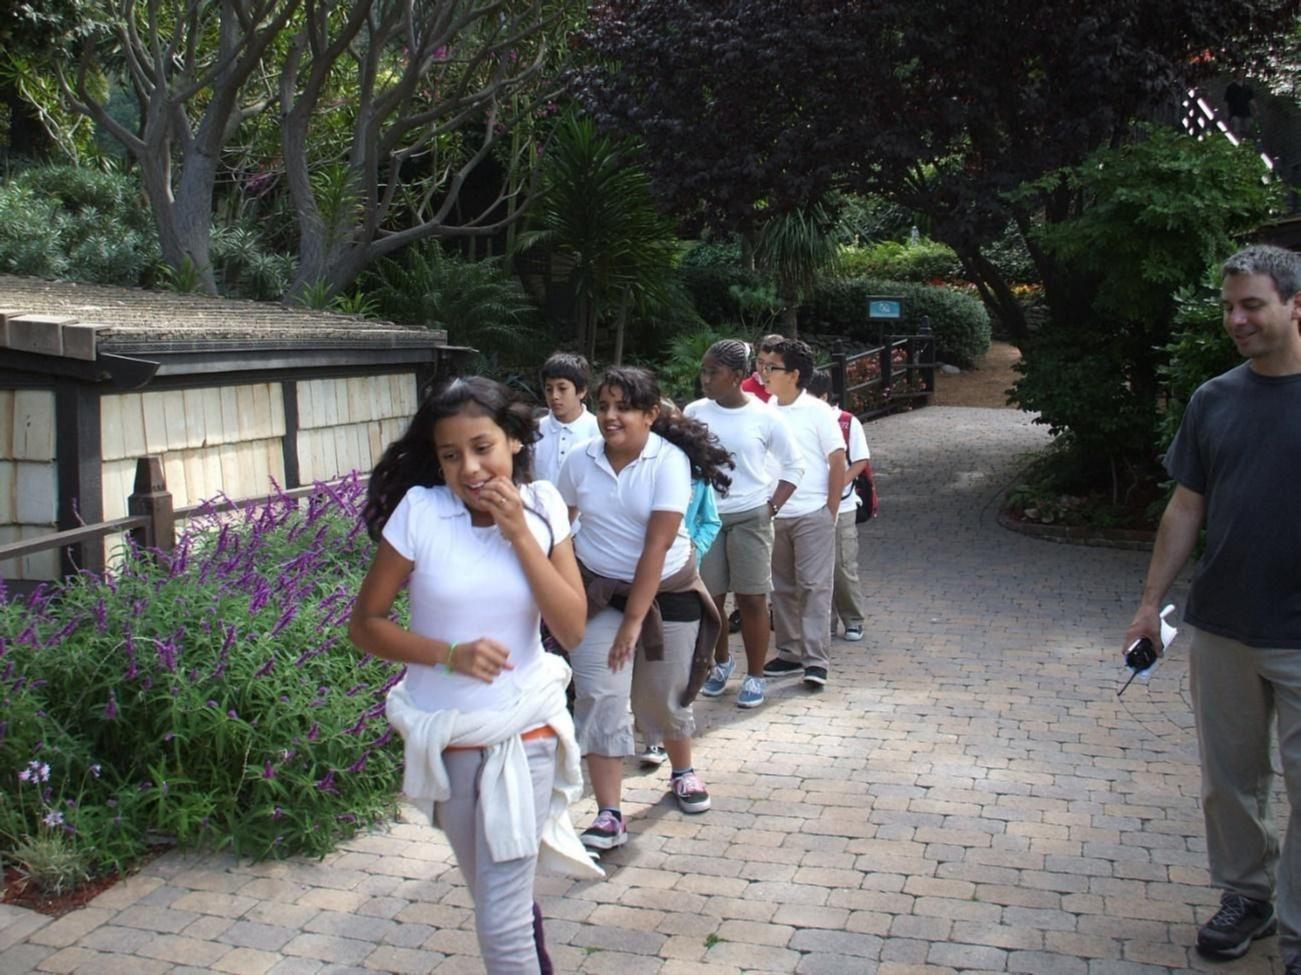 A row of students move through gardens.